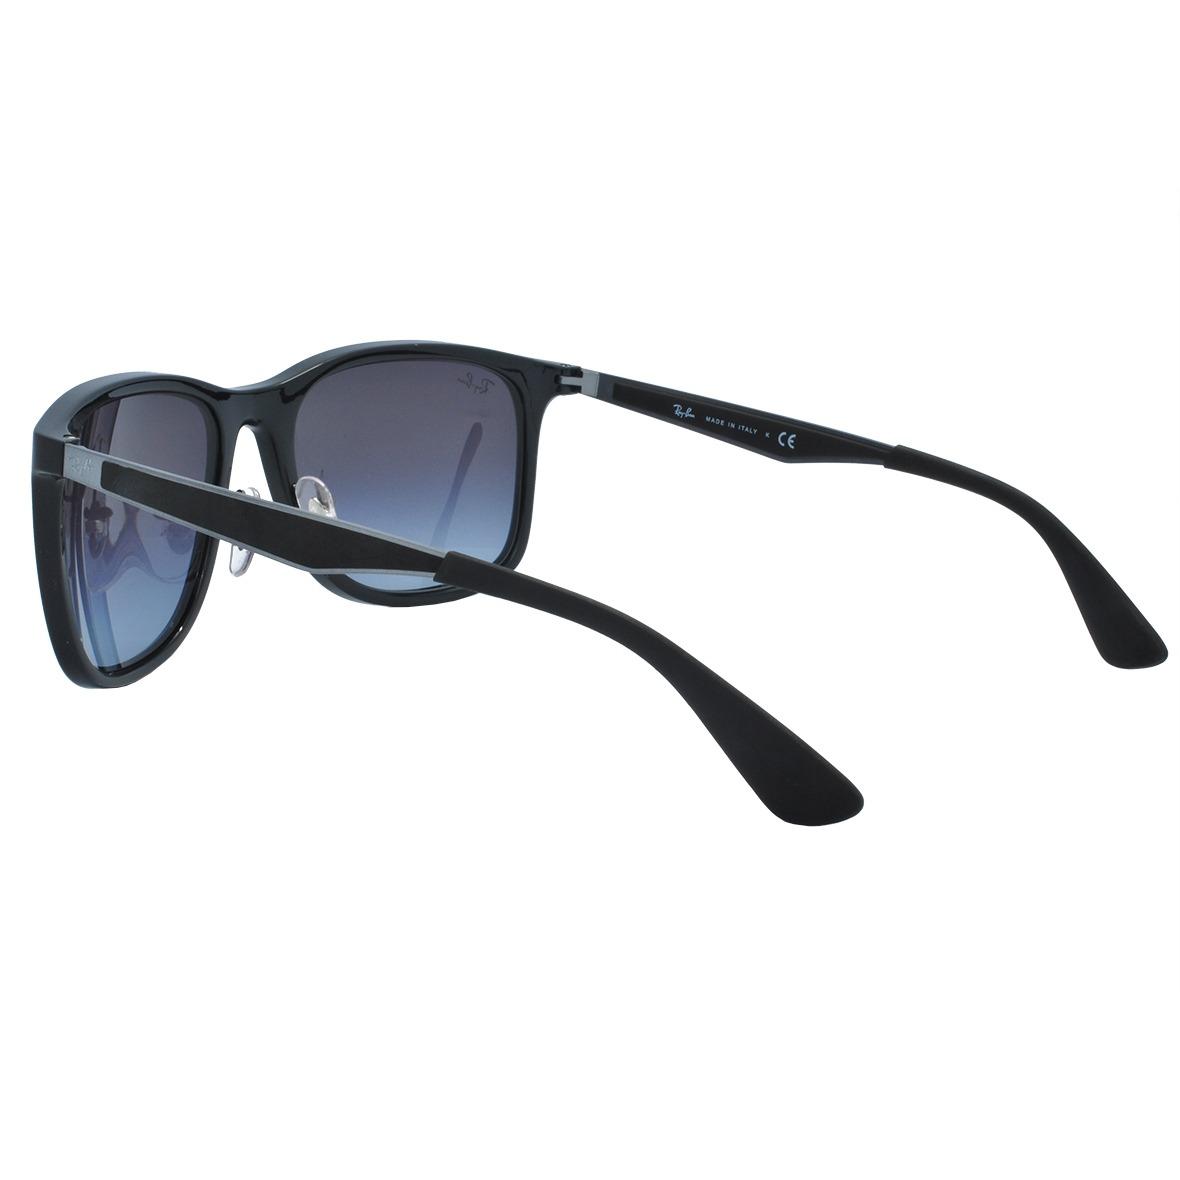 e458113fa óculos de sol ray ban original masculino rb4313 601 8g58. Carregando zoom.